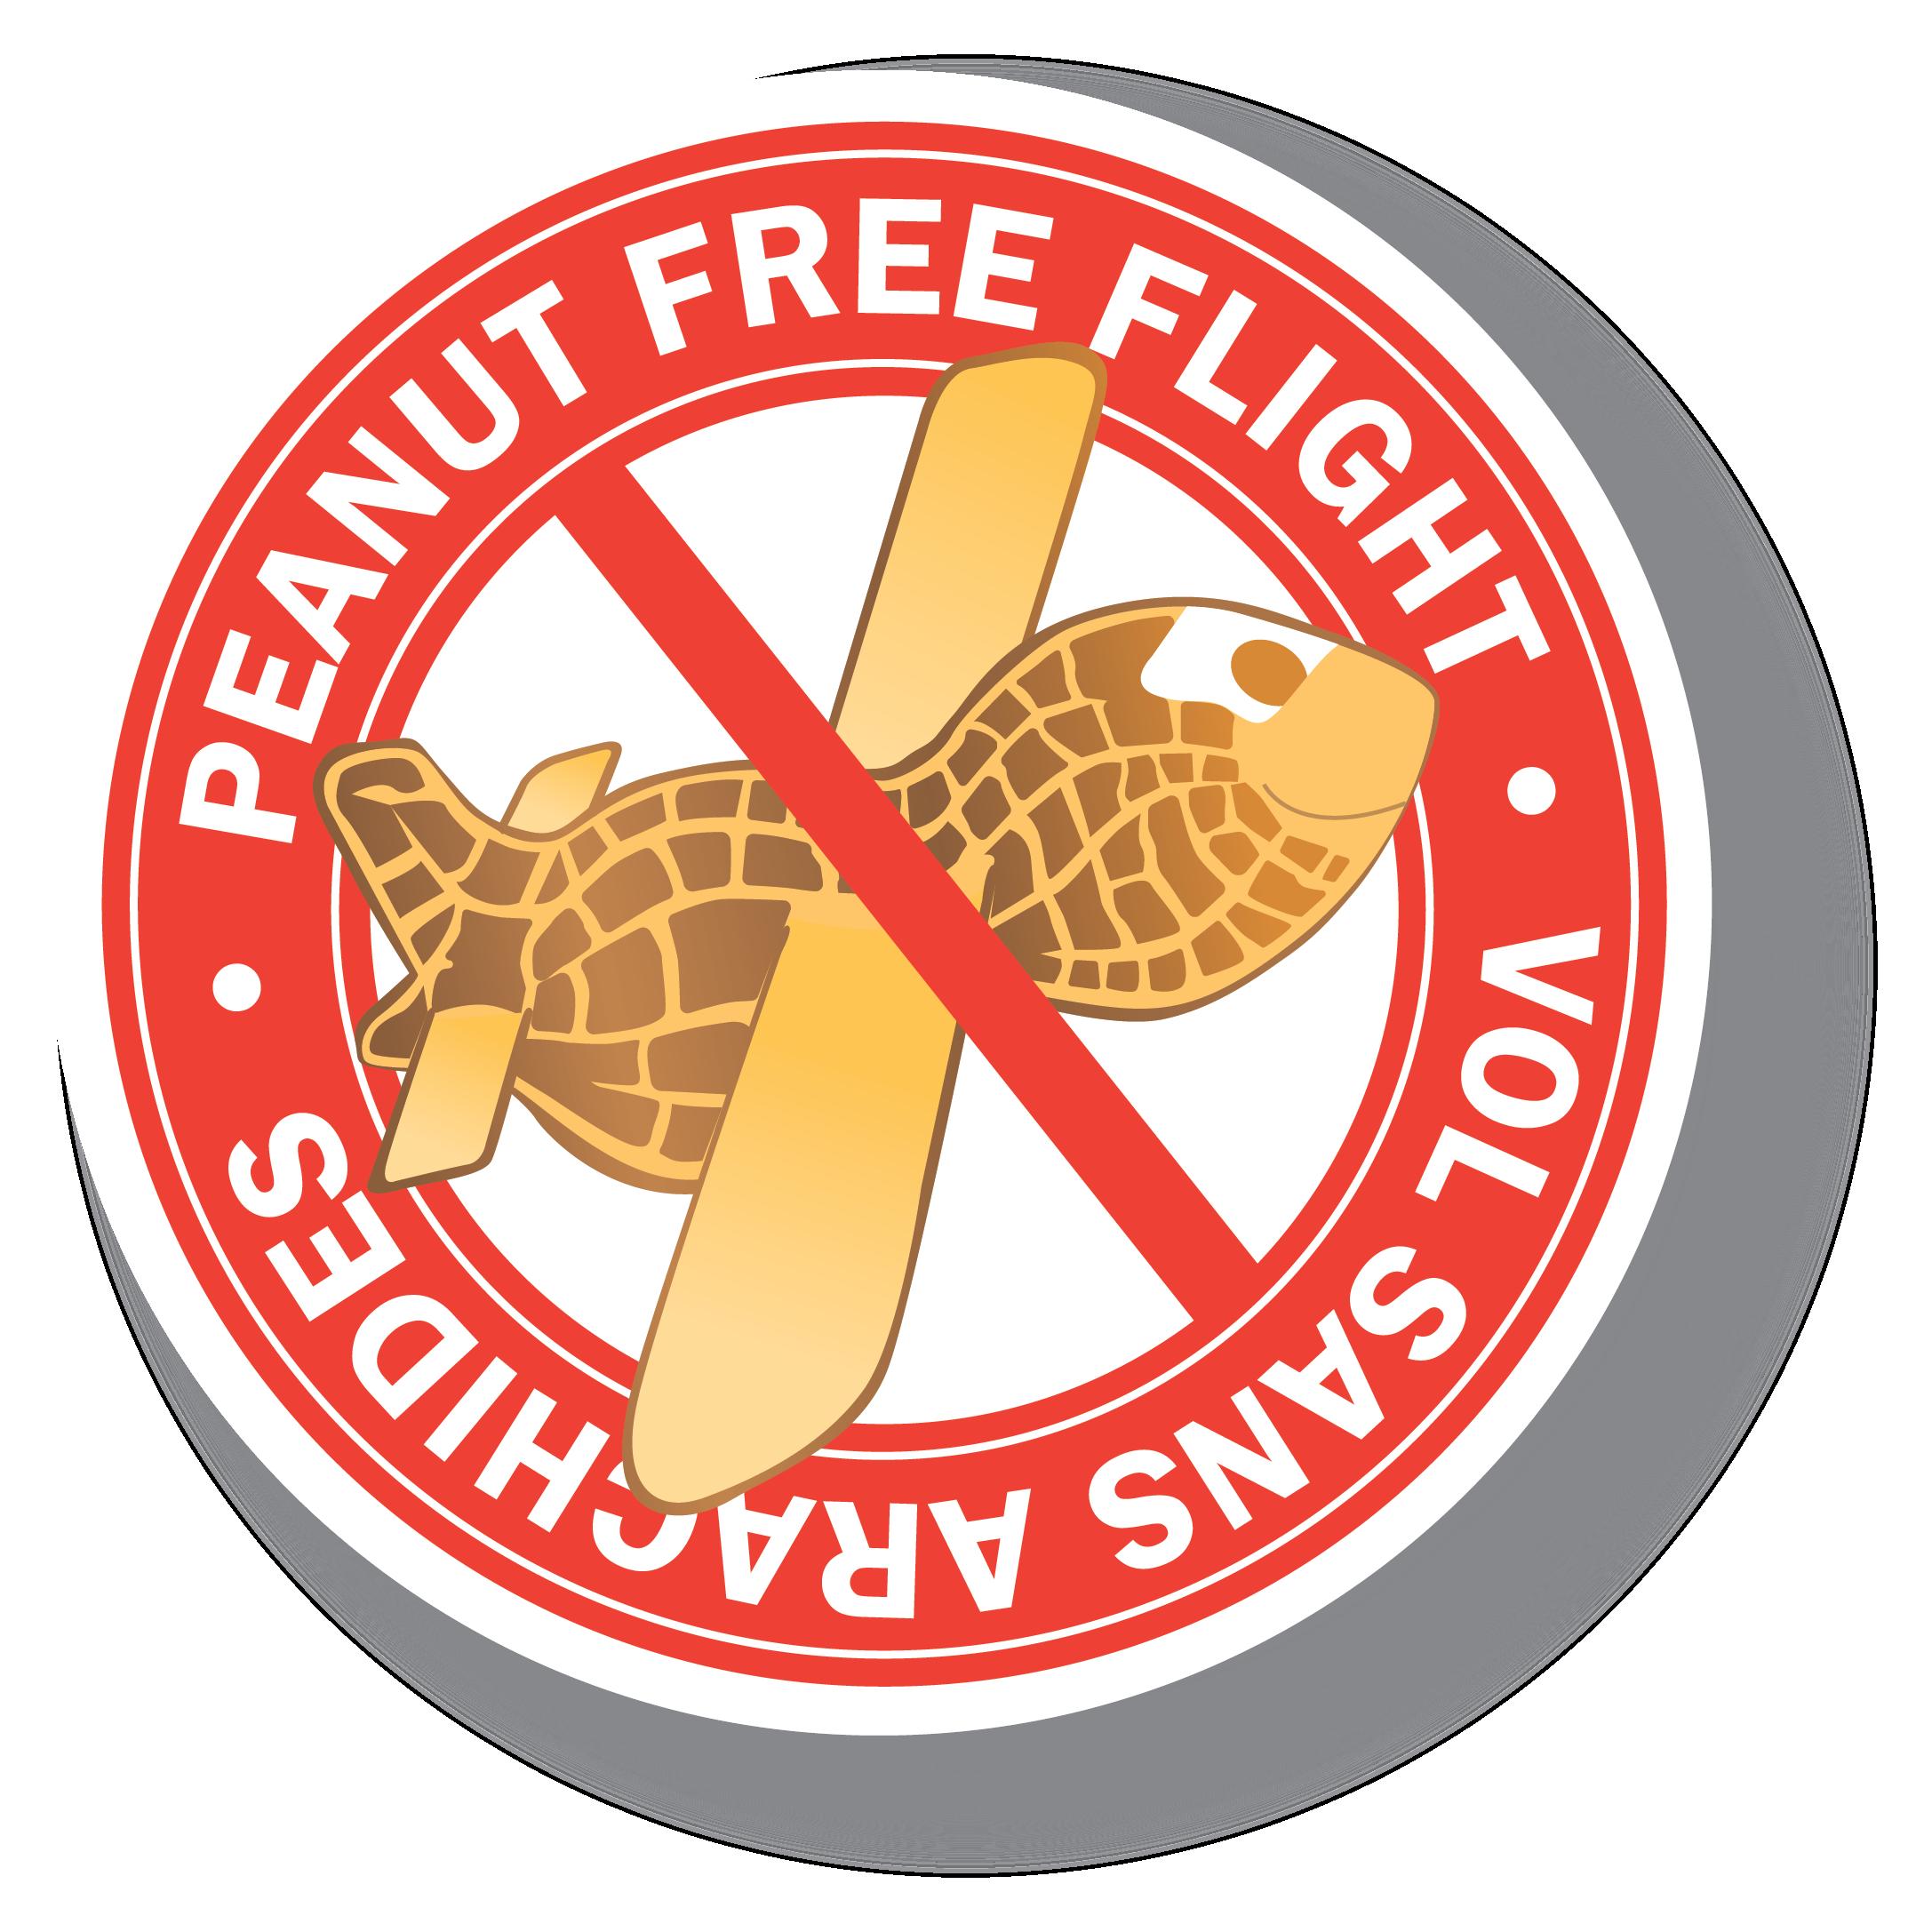 PeanutFreeFlightLogo-Bilingual.png